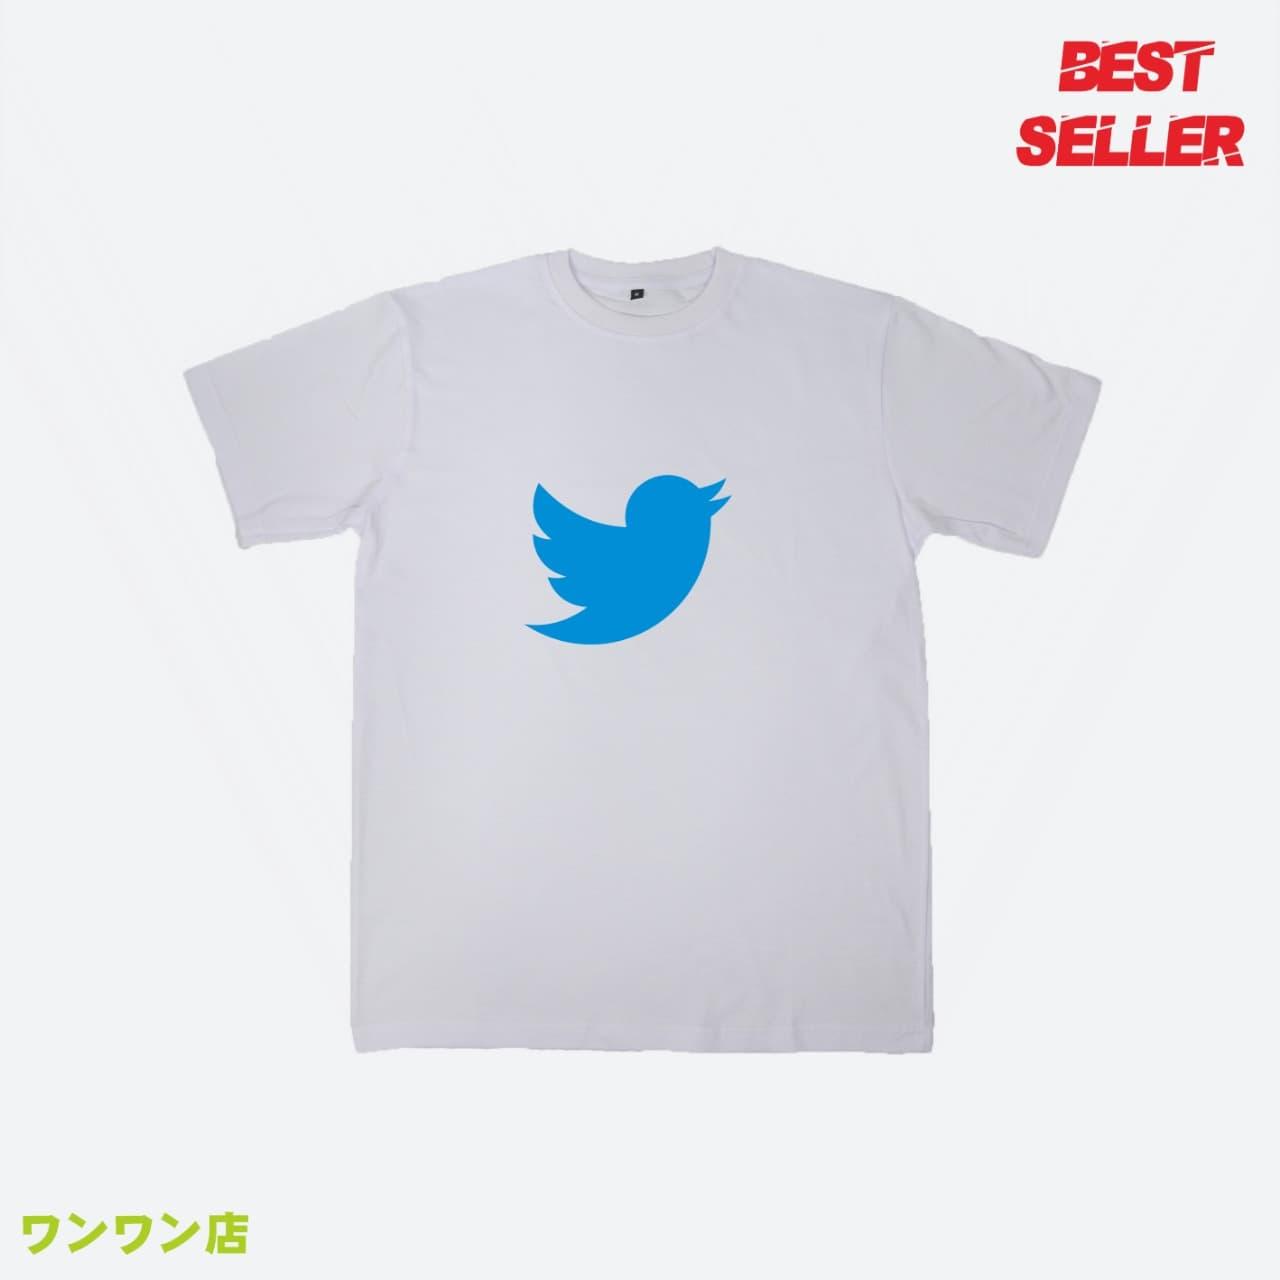 Home Sauna Kits Since 1974 kaos logo twitter - putih m